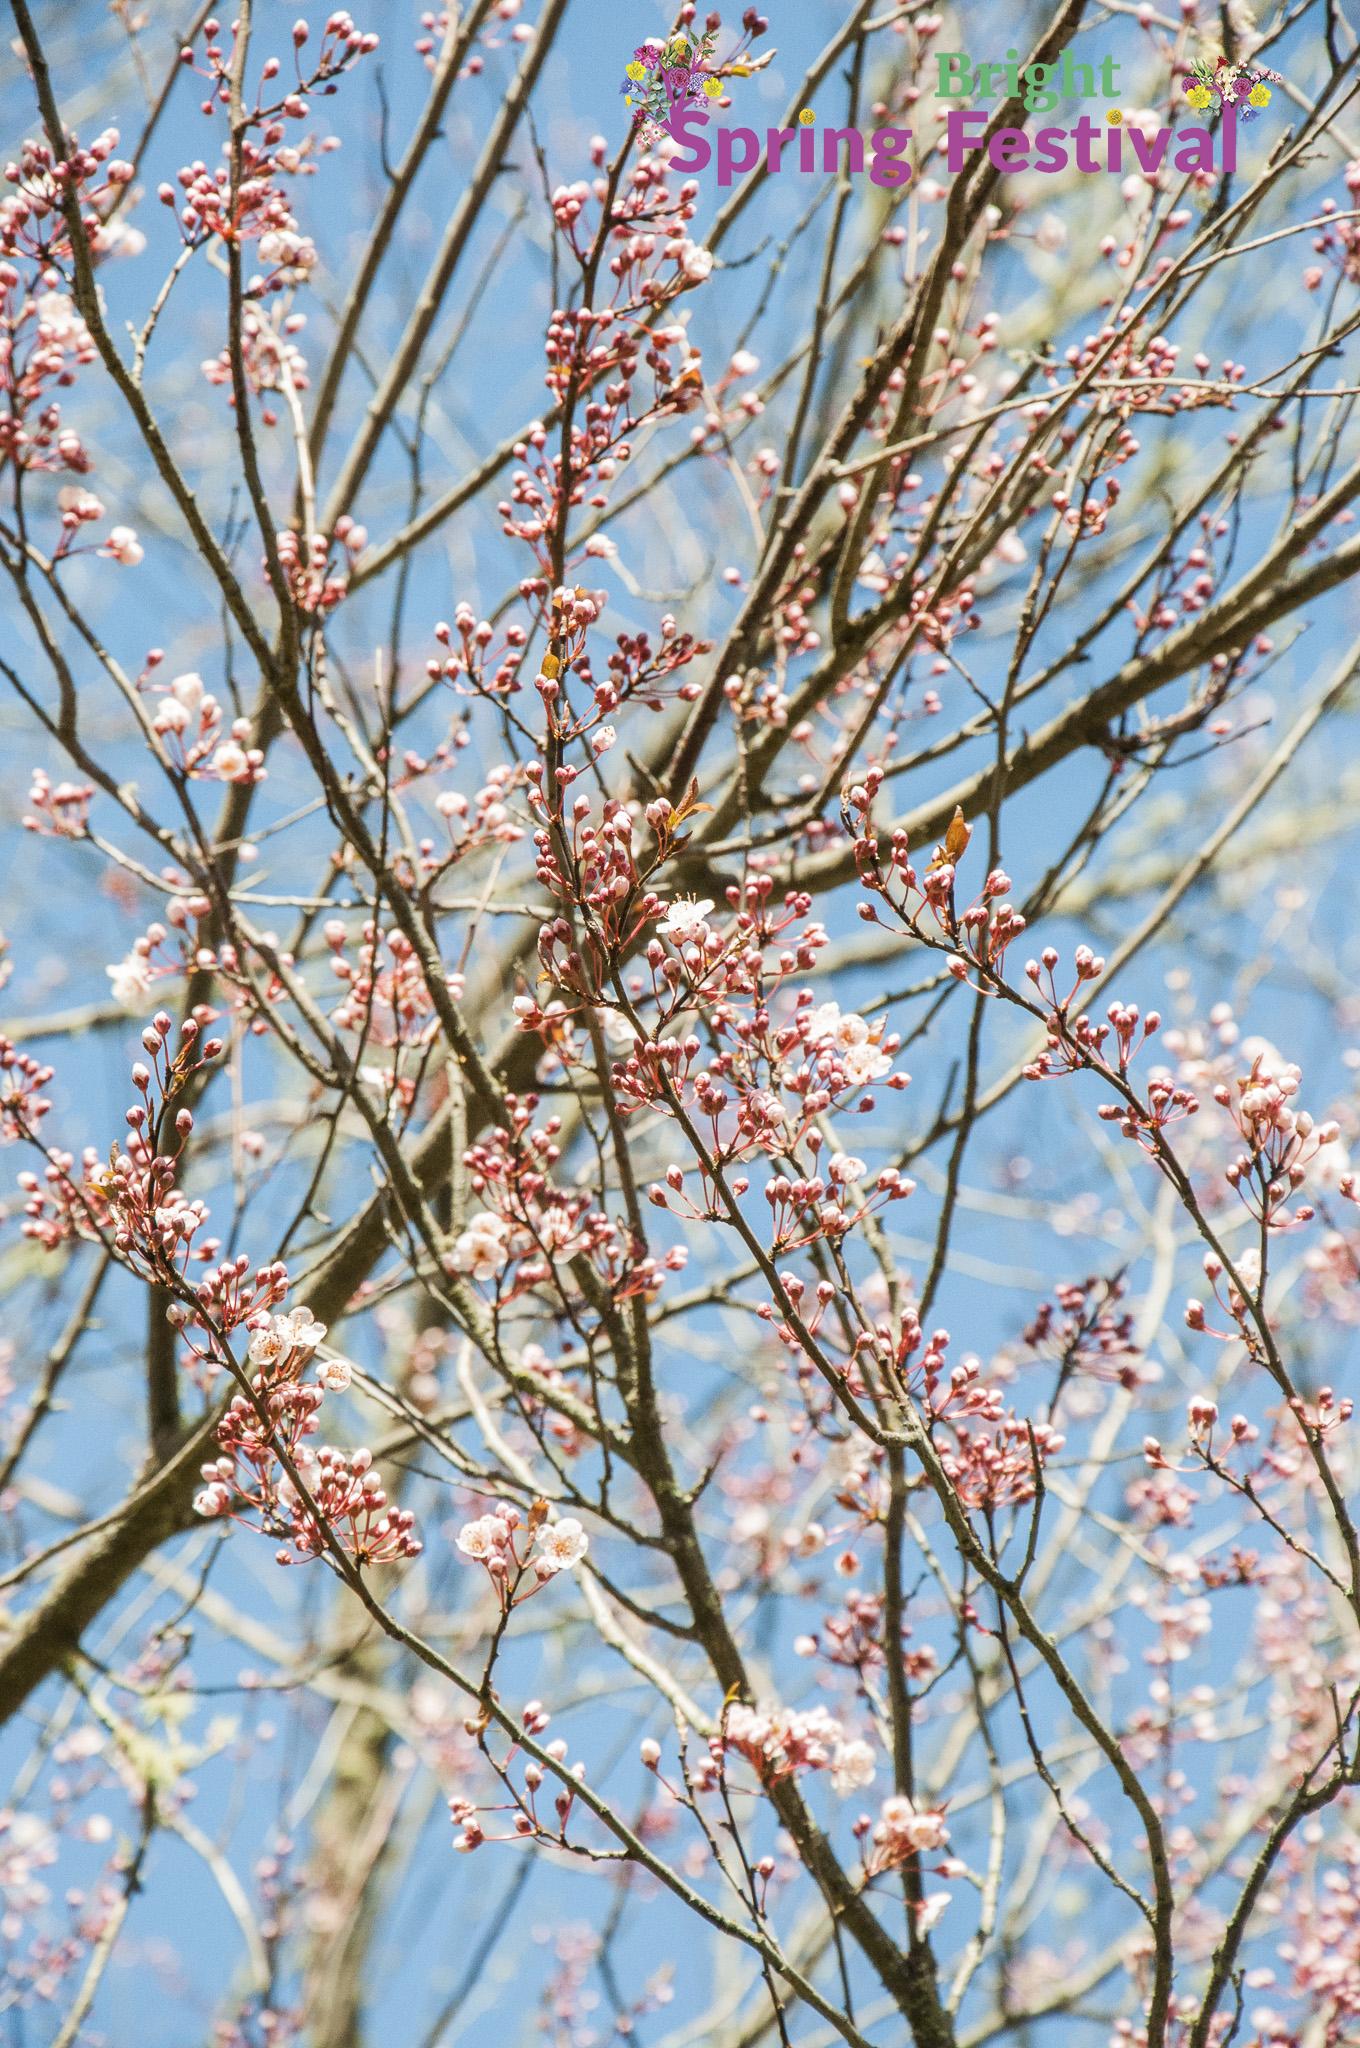 Brigh Spring Festival - 041